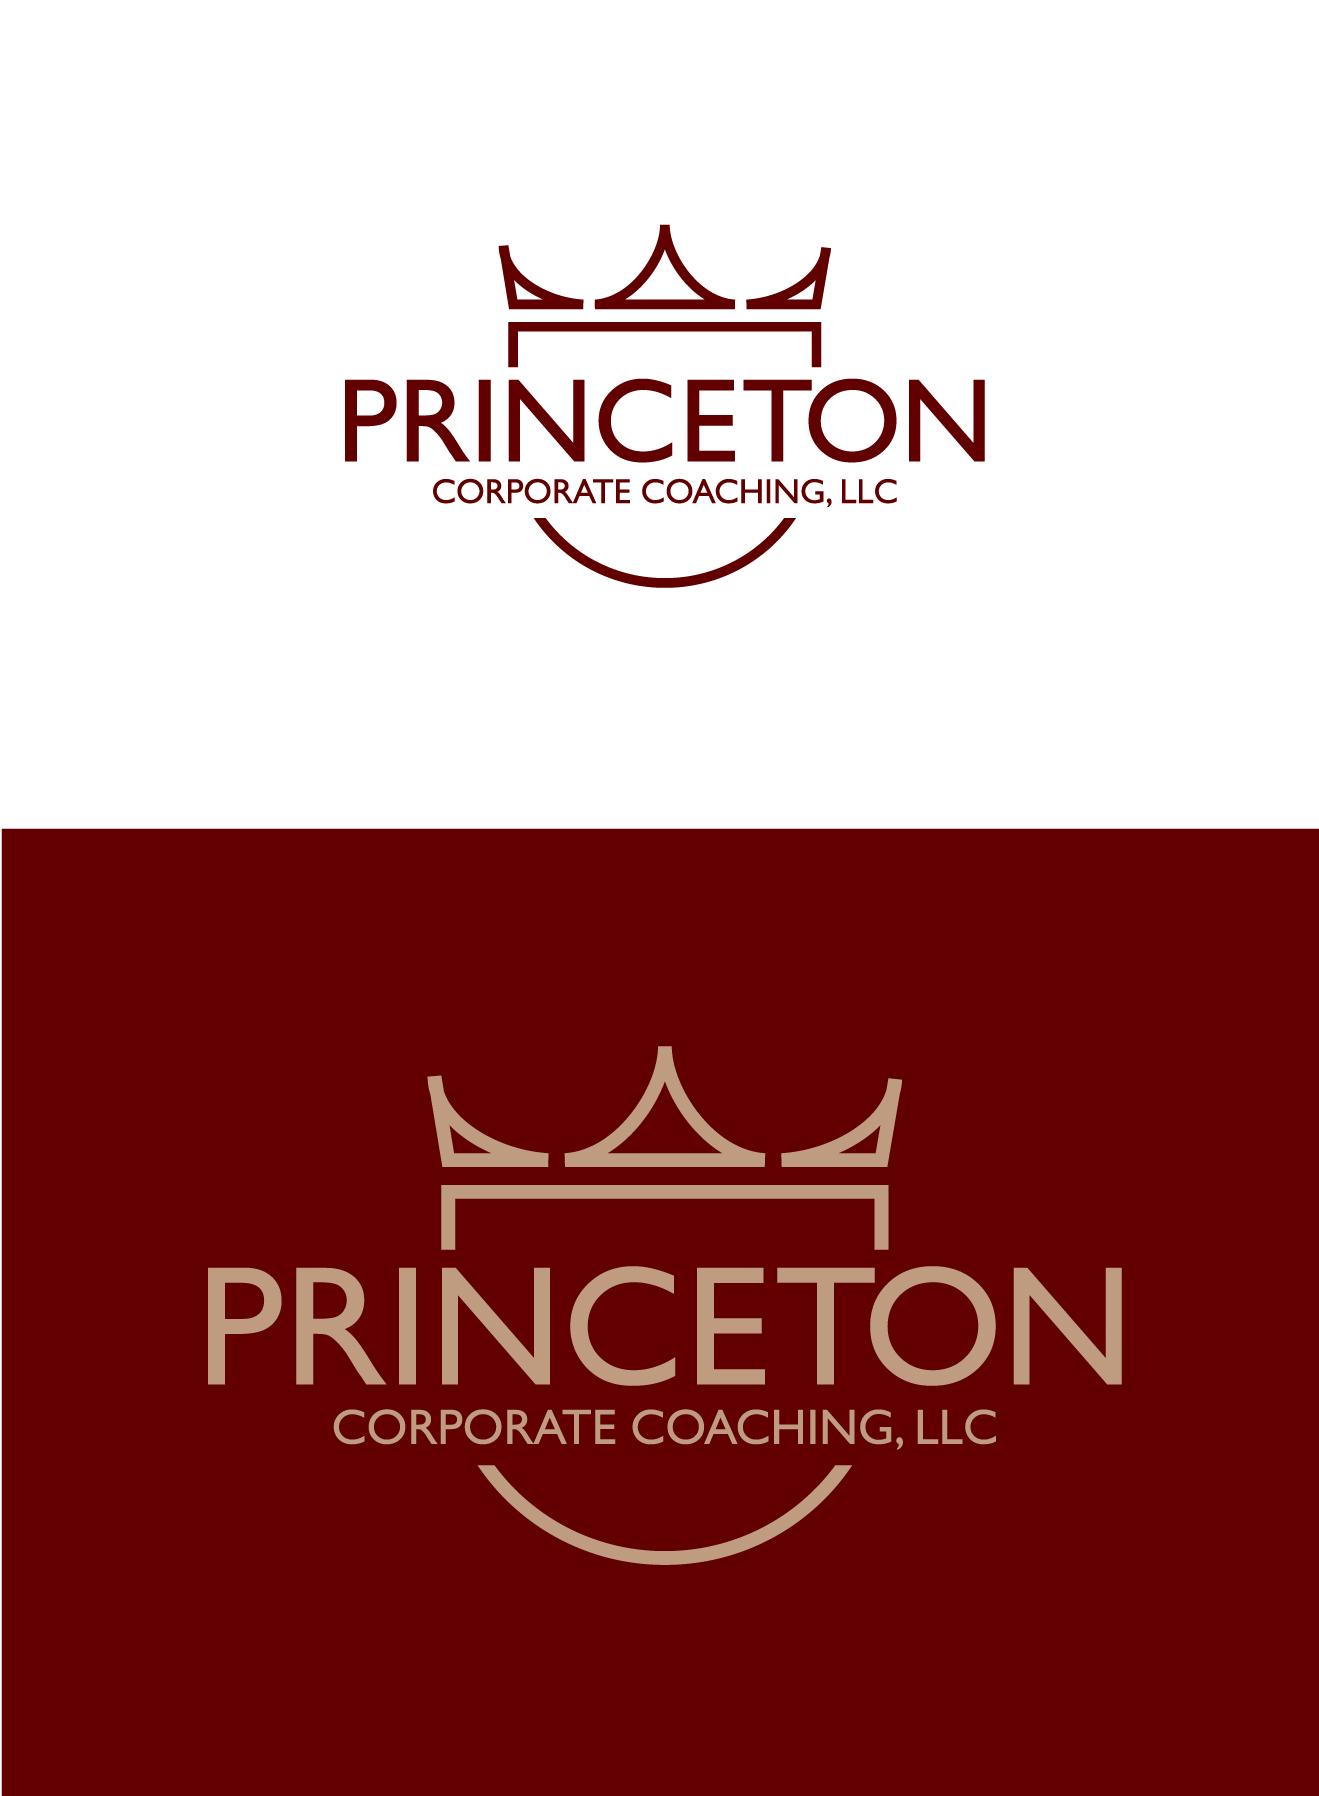 Logo Design by Wilfredo Mendoza - Entry No. 216 in the Logo Design Contest Unique Logo Design Wanted for Princeton Corporate Coaching, LLC.